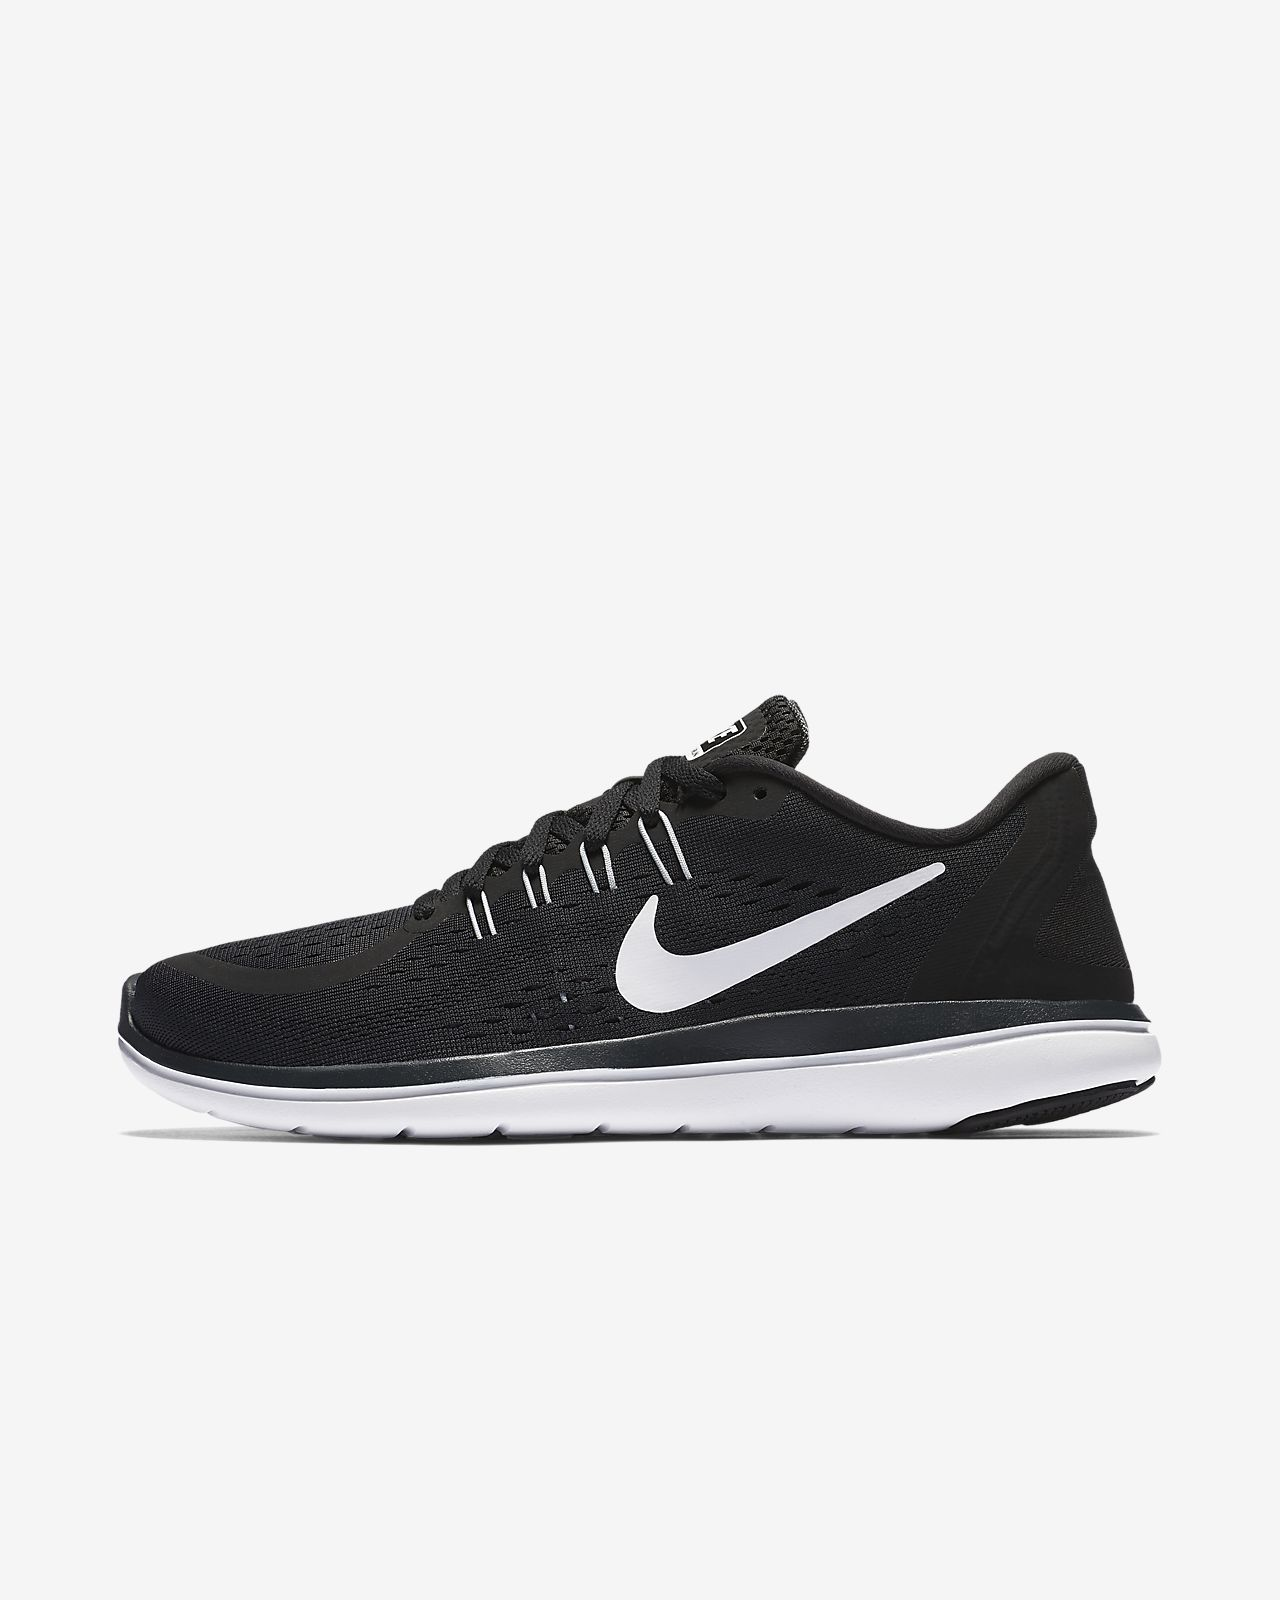 Nike High Cut Shoes Singapore